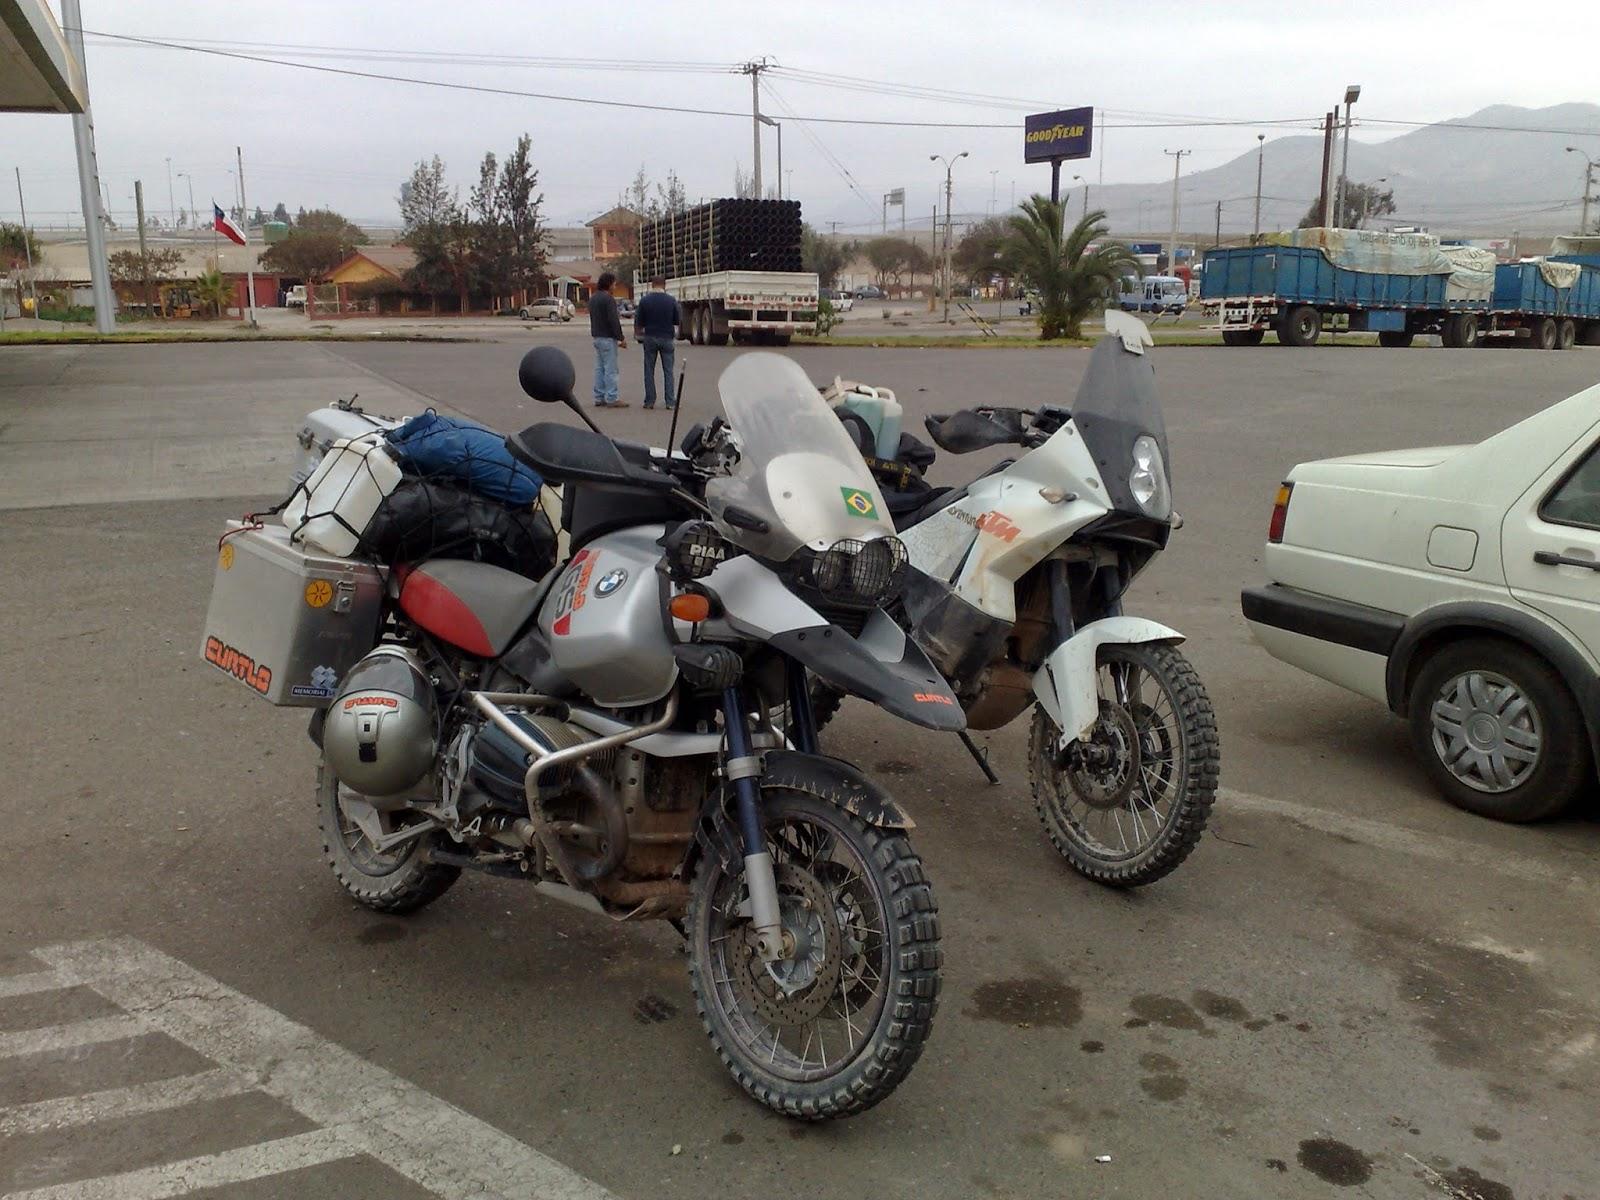 071 14092011807 - AVENTURA: SALAR DE UYUNI E LAGUNAS BOLIVIANAS VIA ACRE